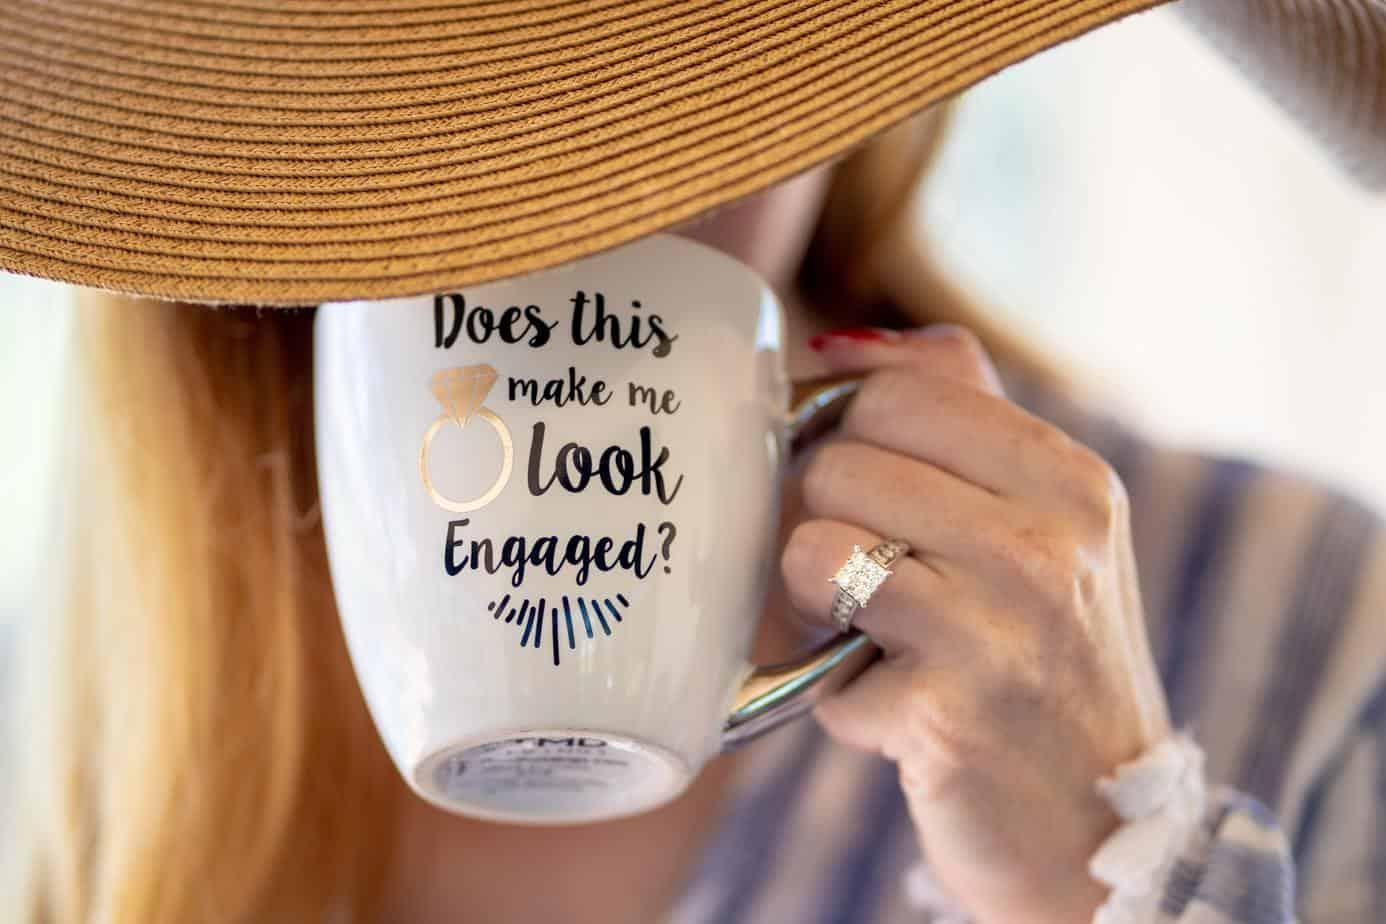 person holding white ceramic mug